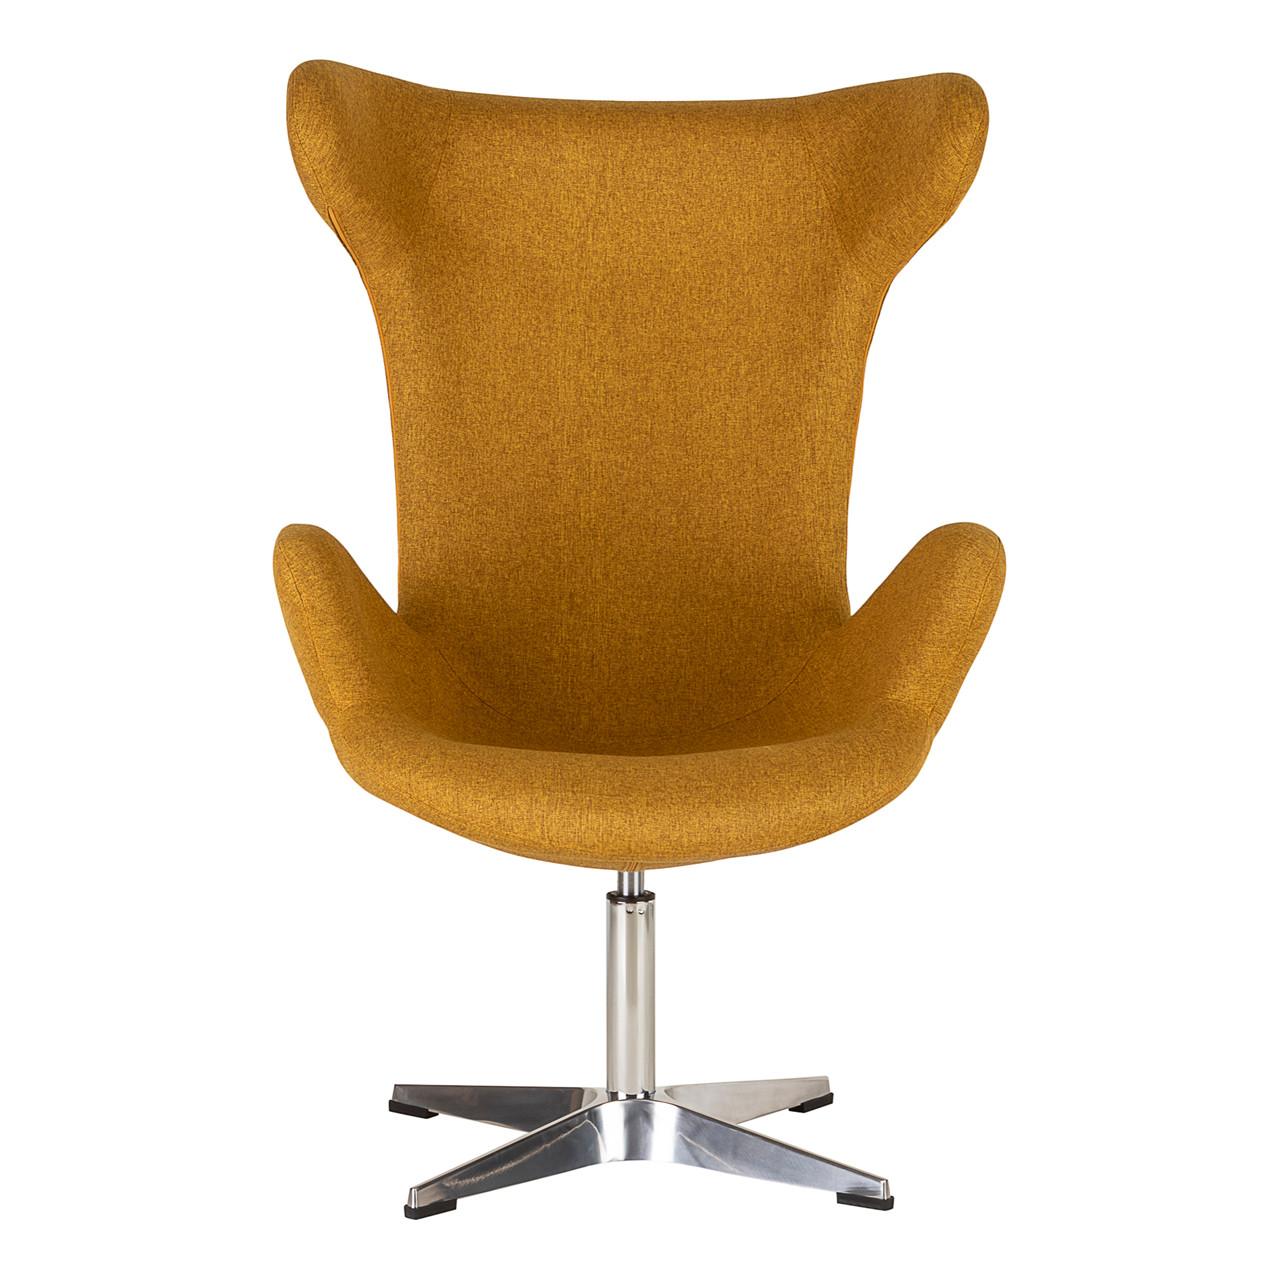 Stole » Se alle Sinnerups flotte stole   Høj kvalitet